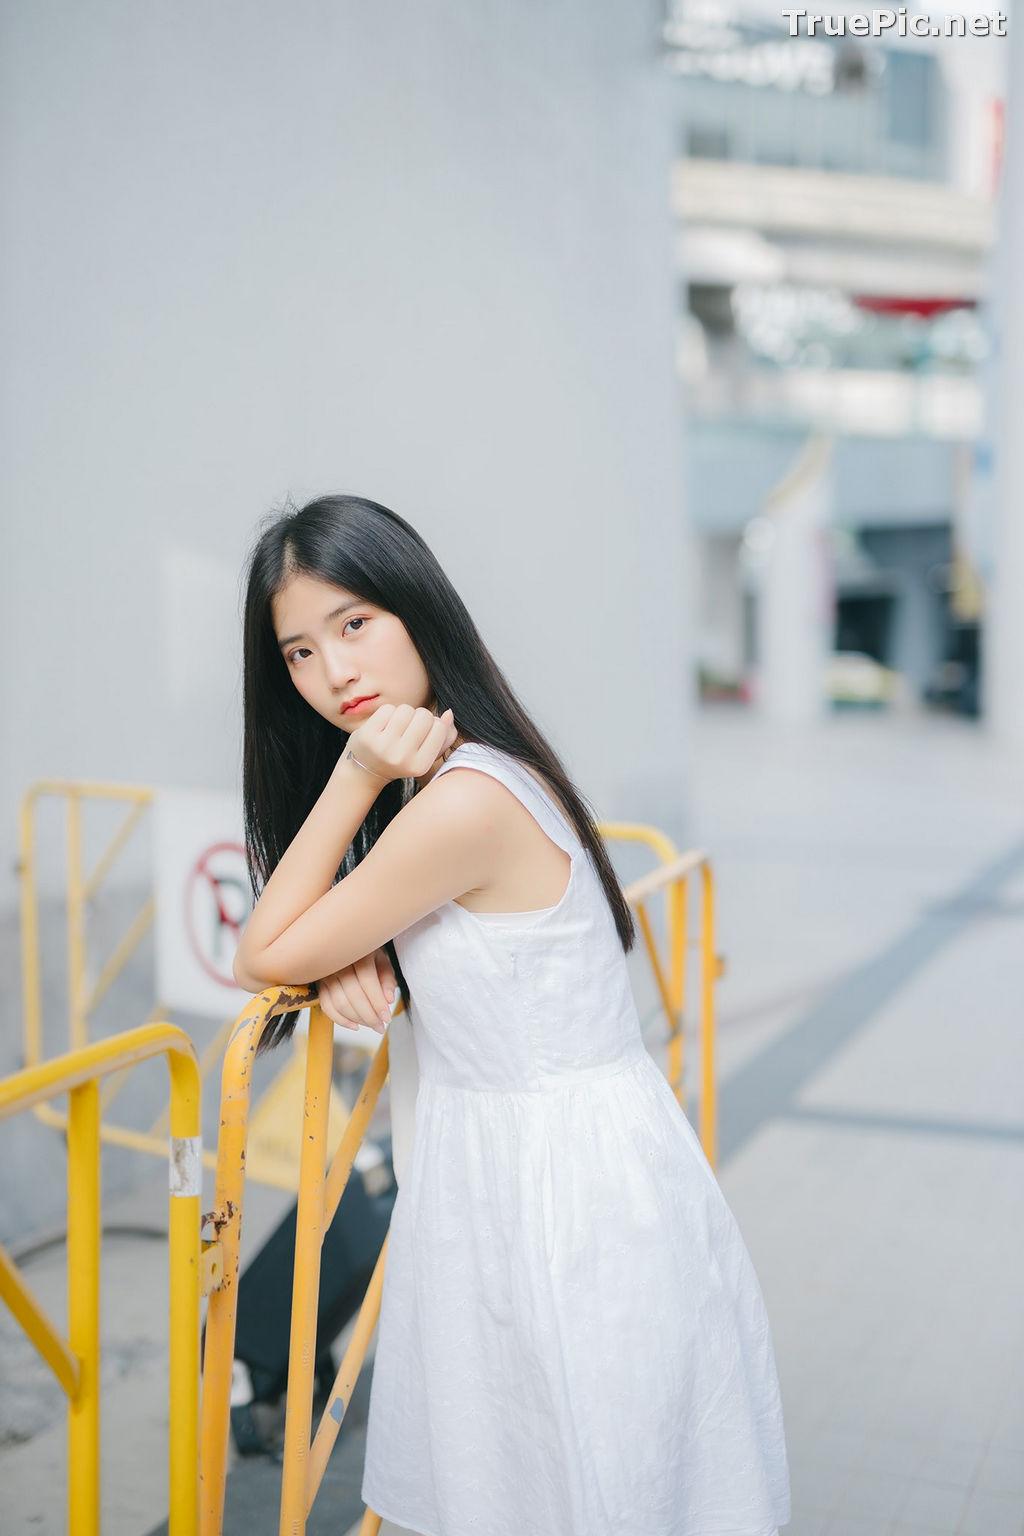 Image Thailand Model - Venita Loywattanakul - A Beautiful White - TruePic.net - Picture-7